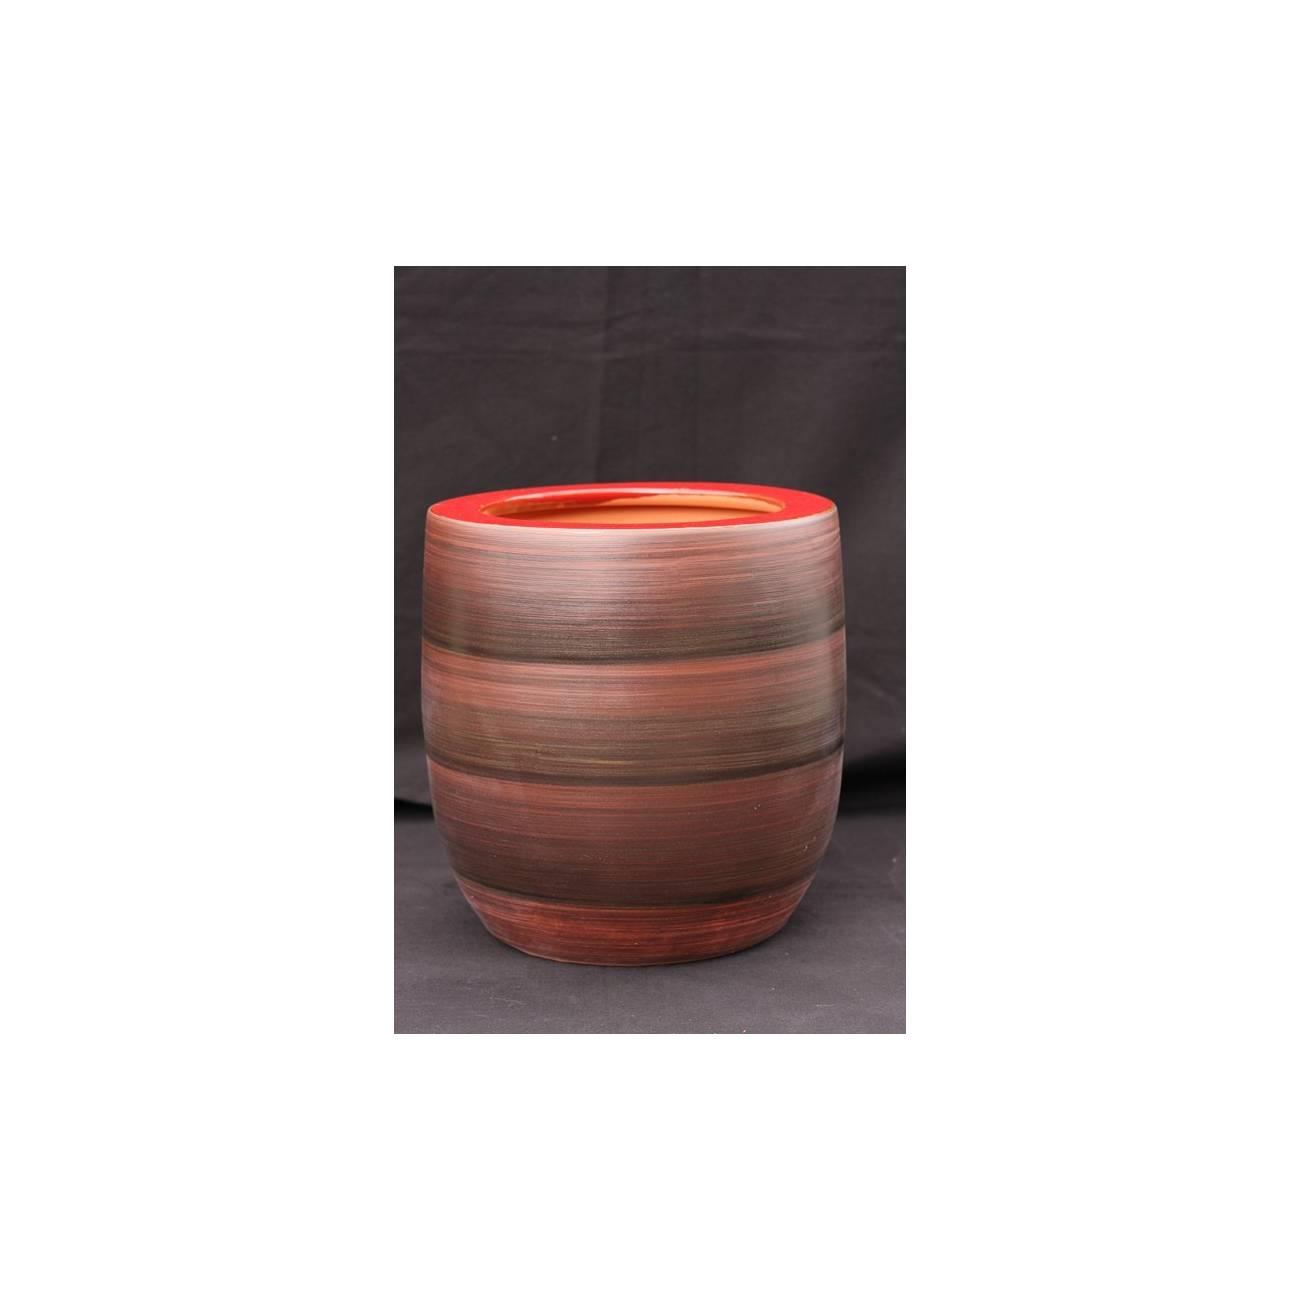 totem terre d 39 afrique vase rouge les poteries d 39 albi. Black Bedroom Furniture Sets. Home Design Ideas